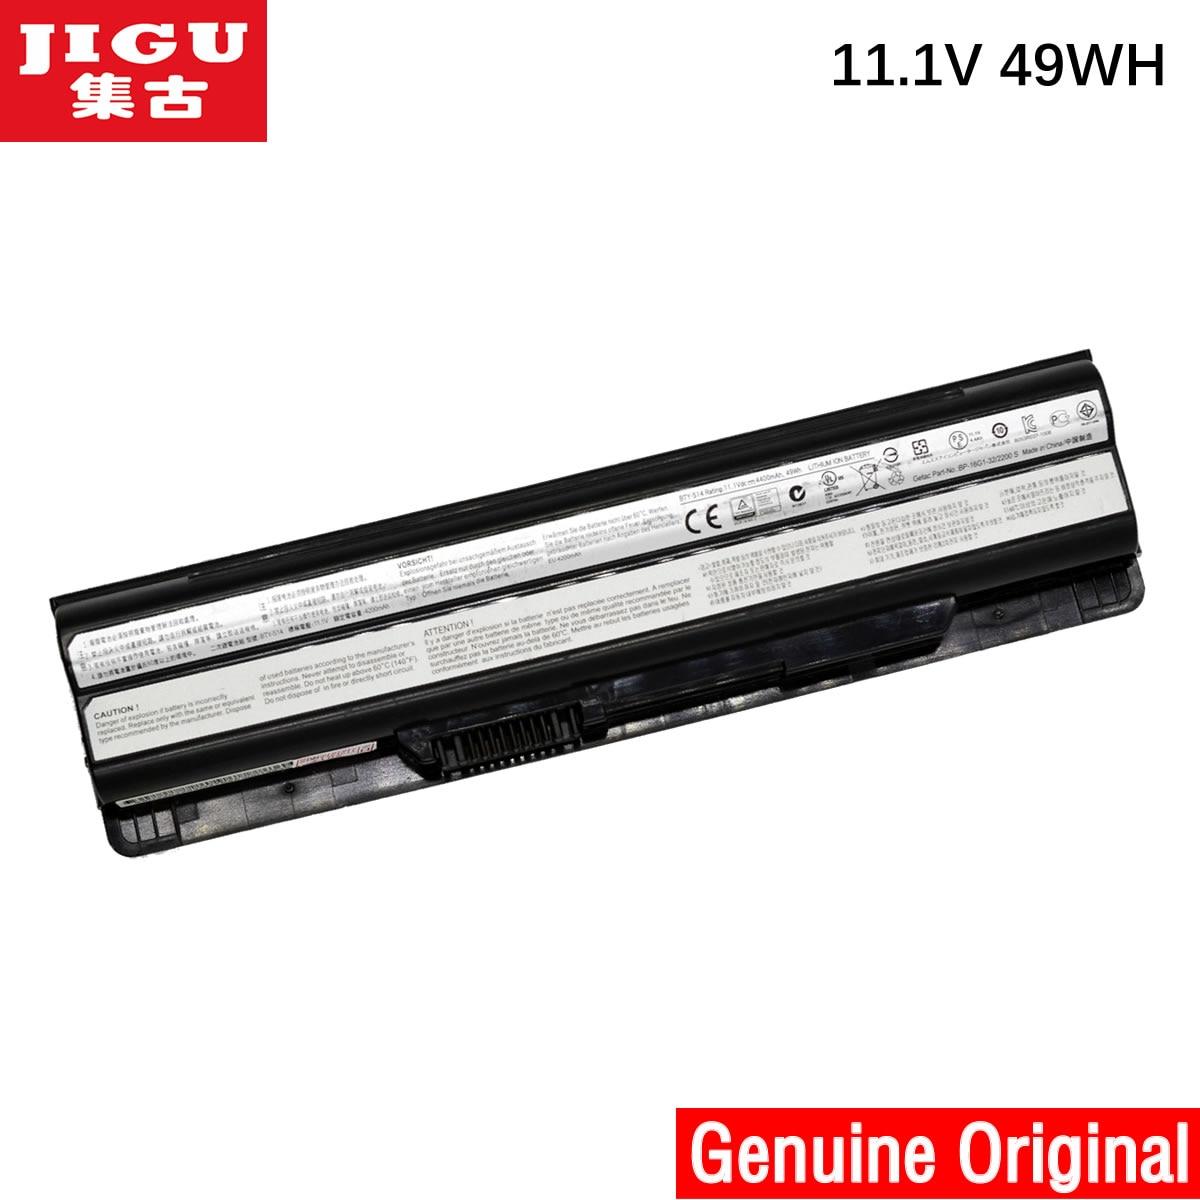 JIGU Batteria del computer portatile Originale BTY-S14 S15 Per MSI CR41 CR650 CX61 CX650 CX70 FR400 FR600 FR610 FR620 FR700 FX400 FX420 FX600